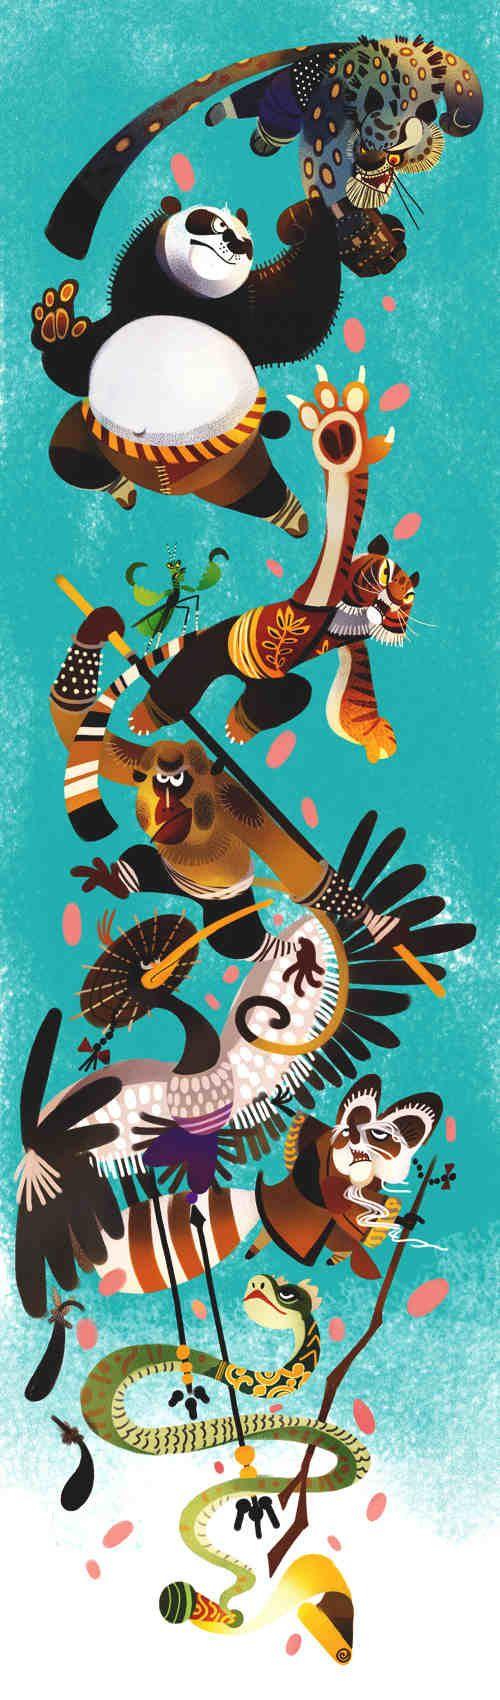 Kung Fu Panda - Kasidej Hempromaraj ---- ★ Find more at http://www.pinterest.com/competing/